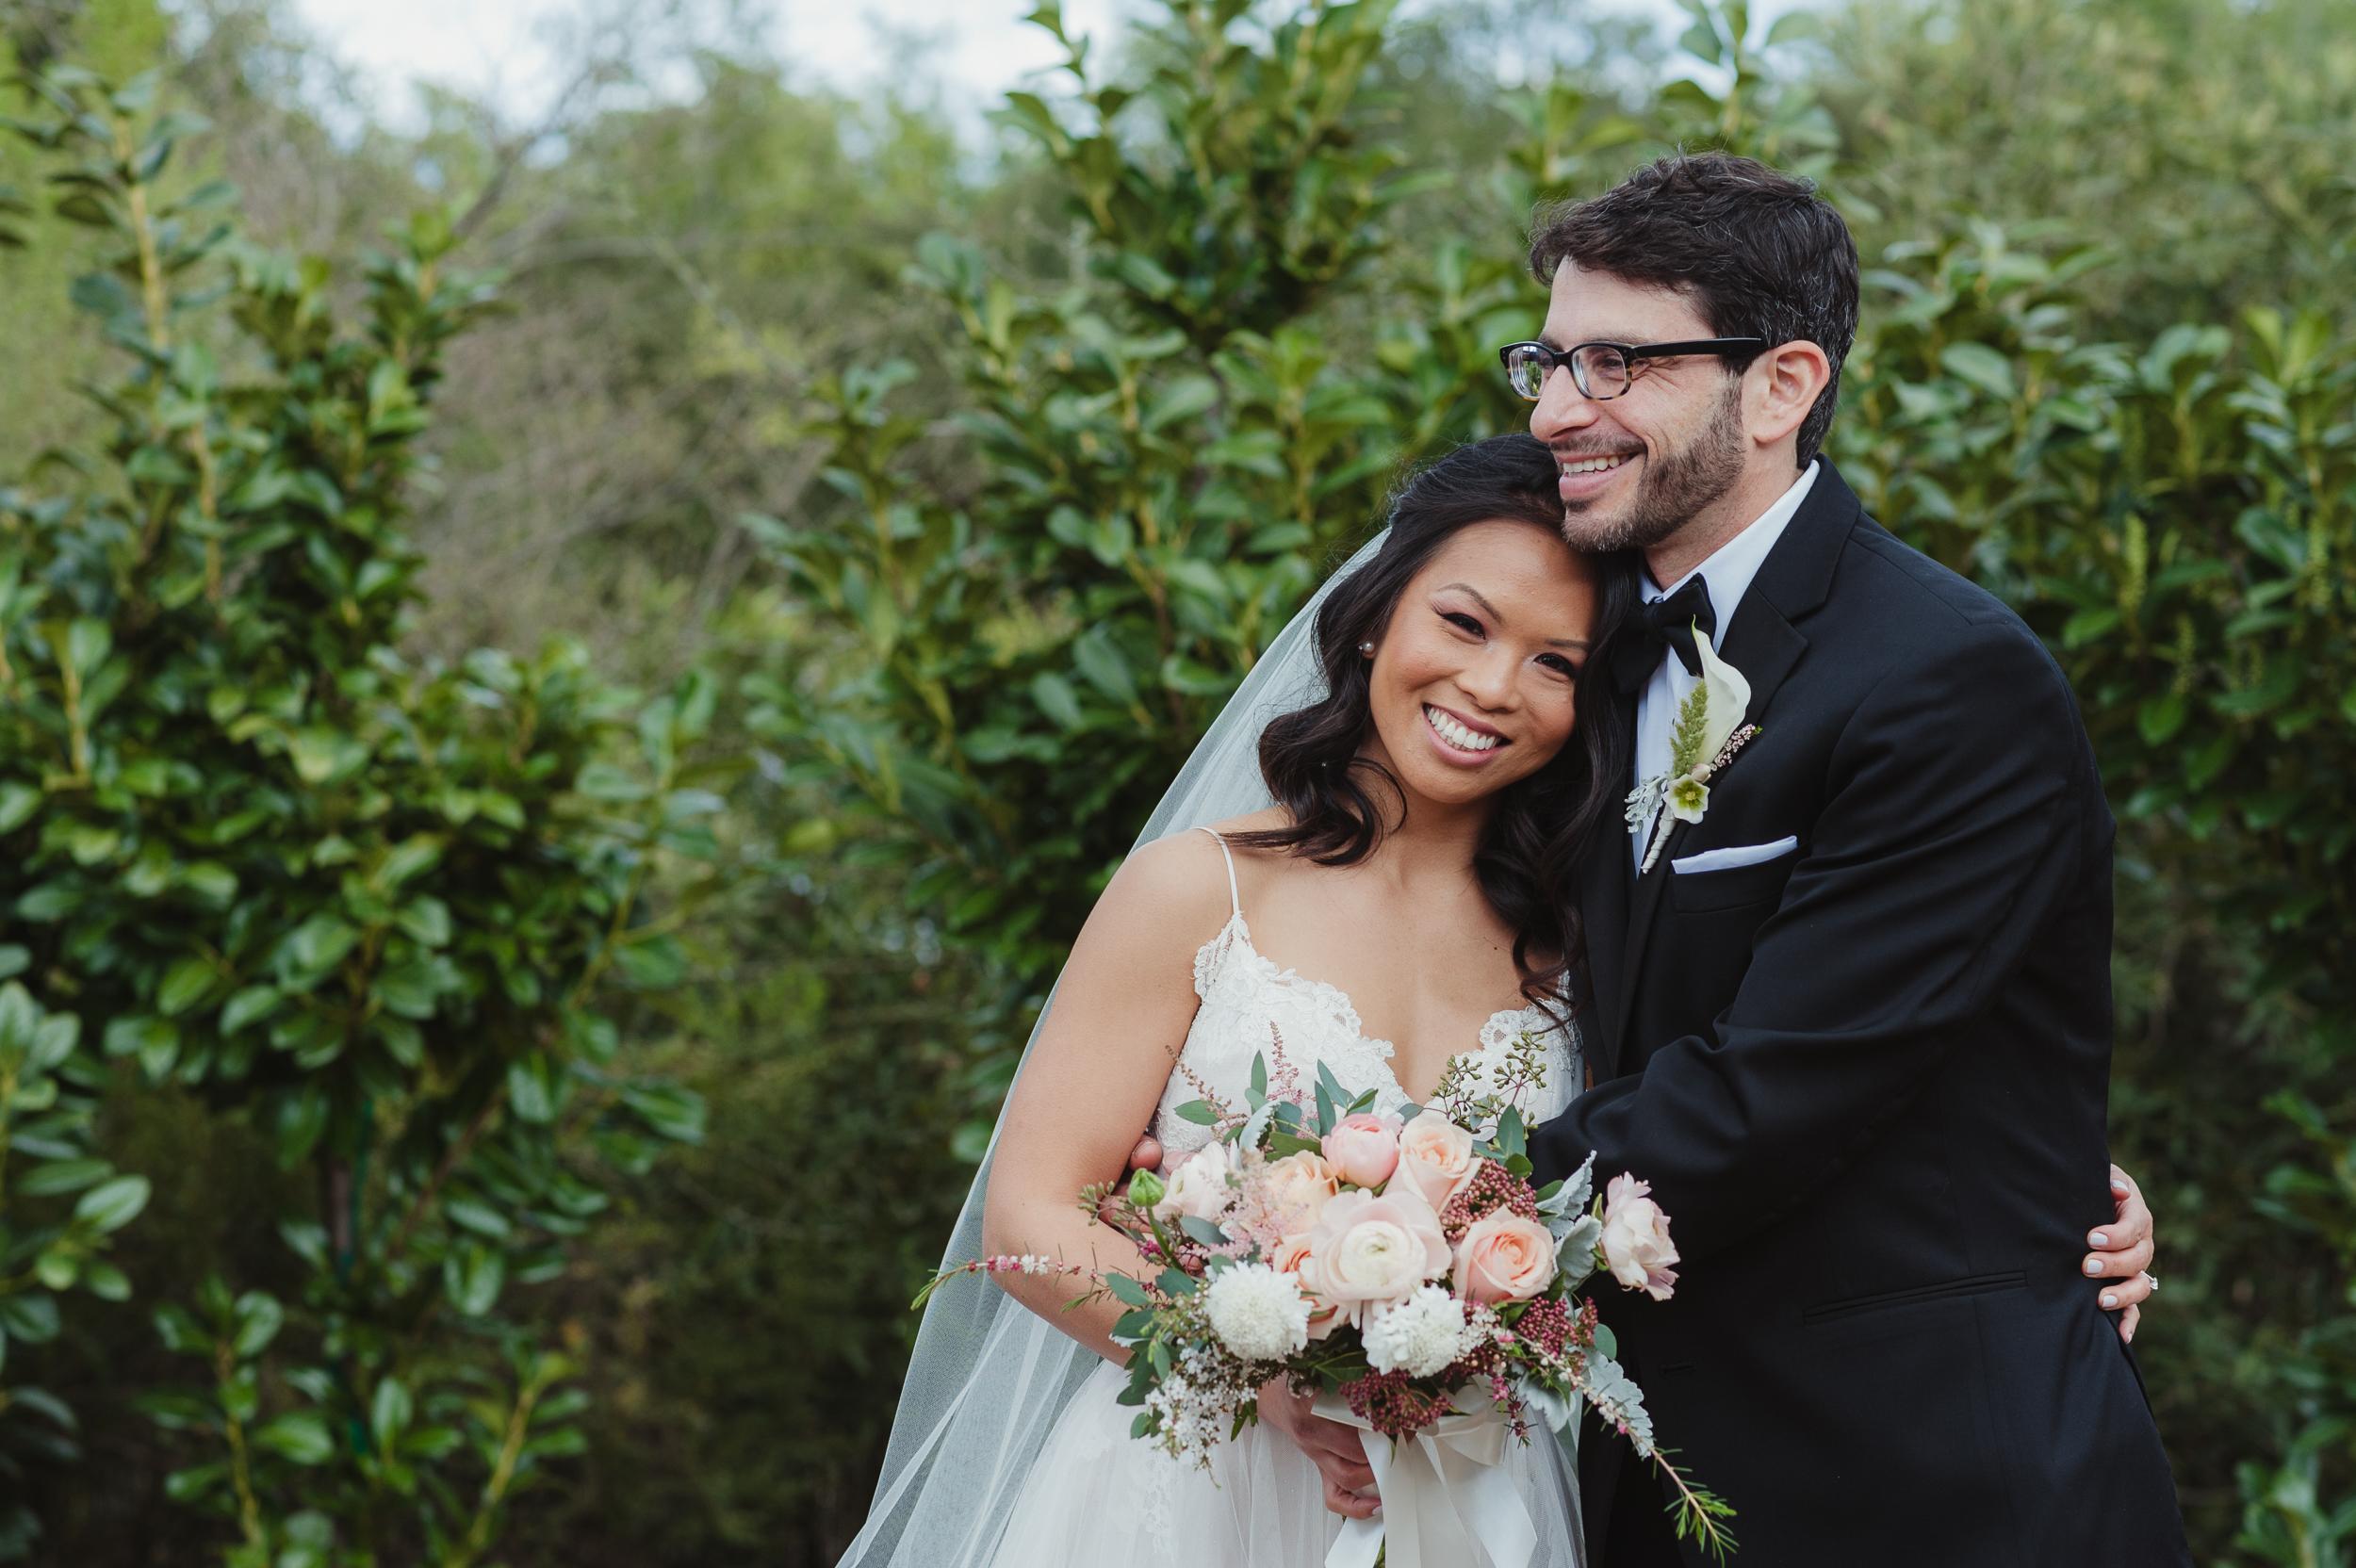 13-woodside-backyard-wedding-vivianchen-0212.jpg